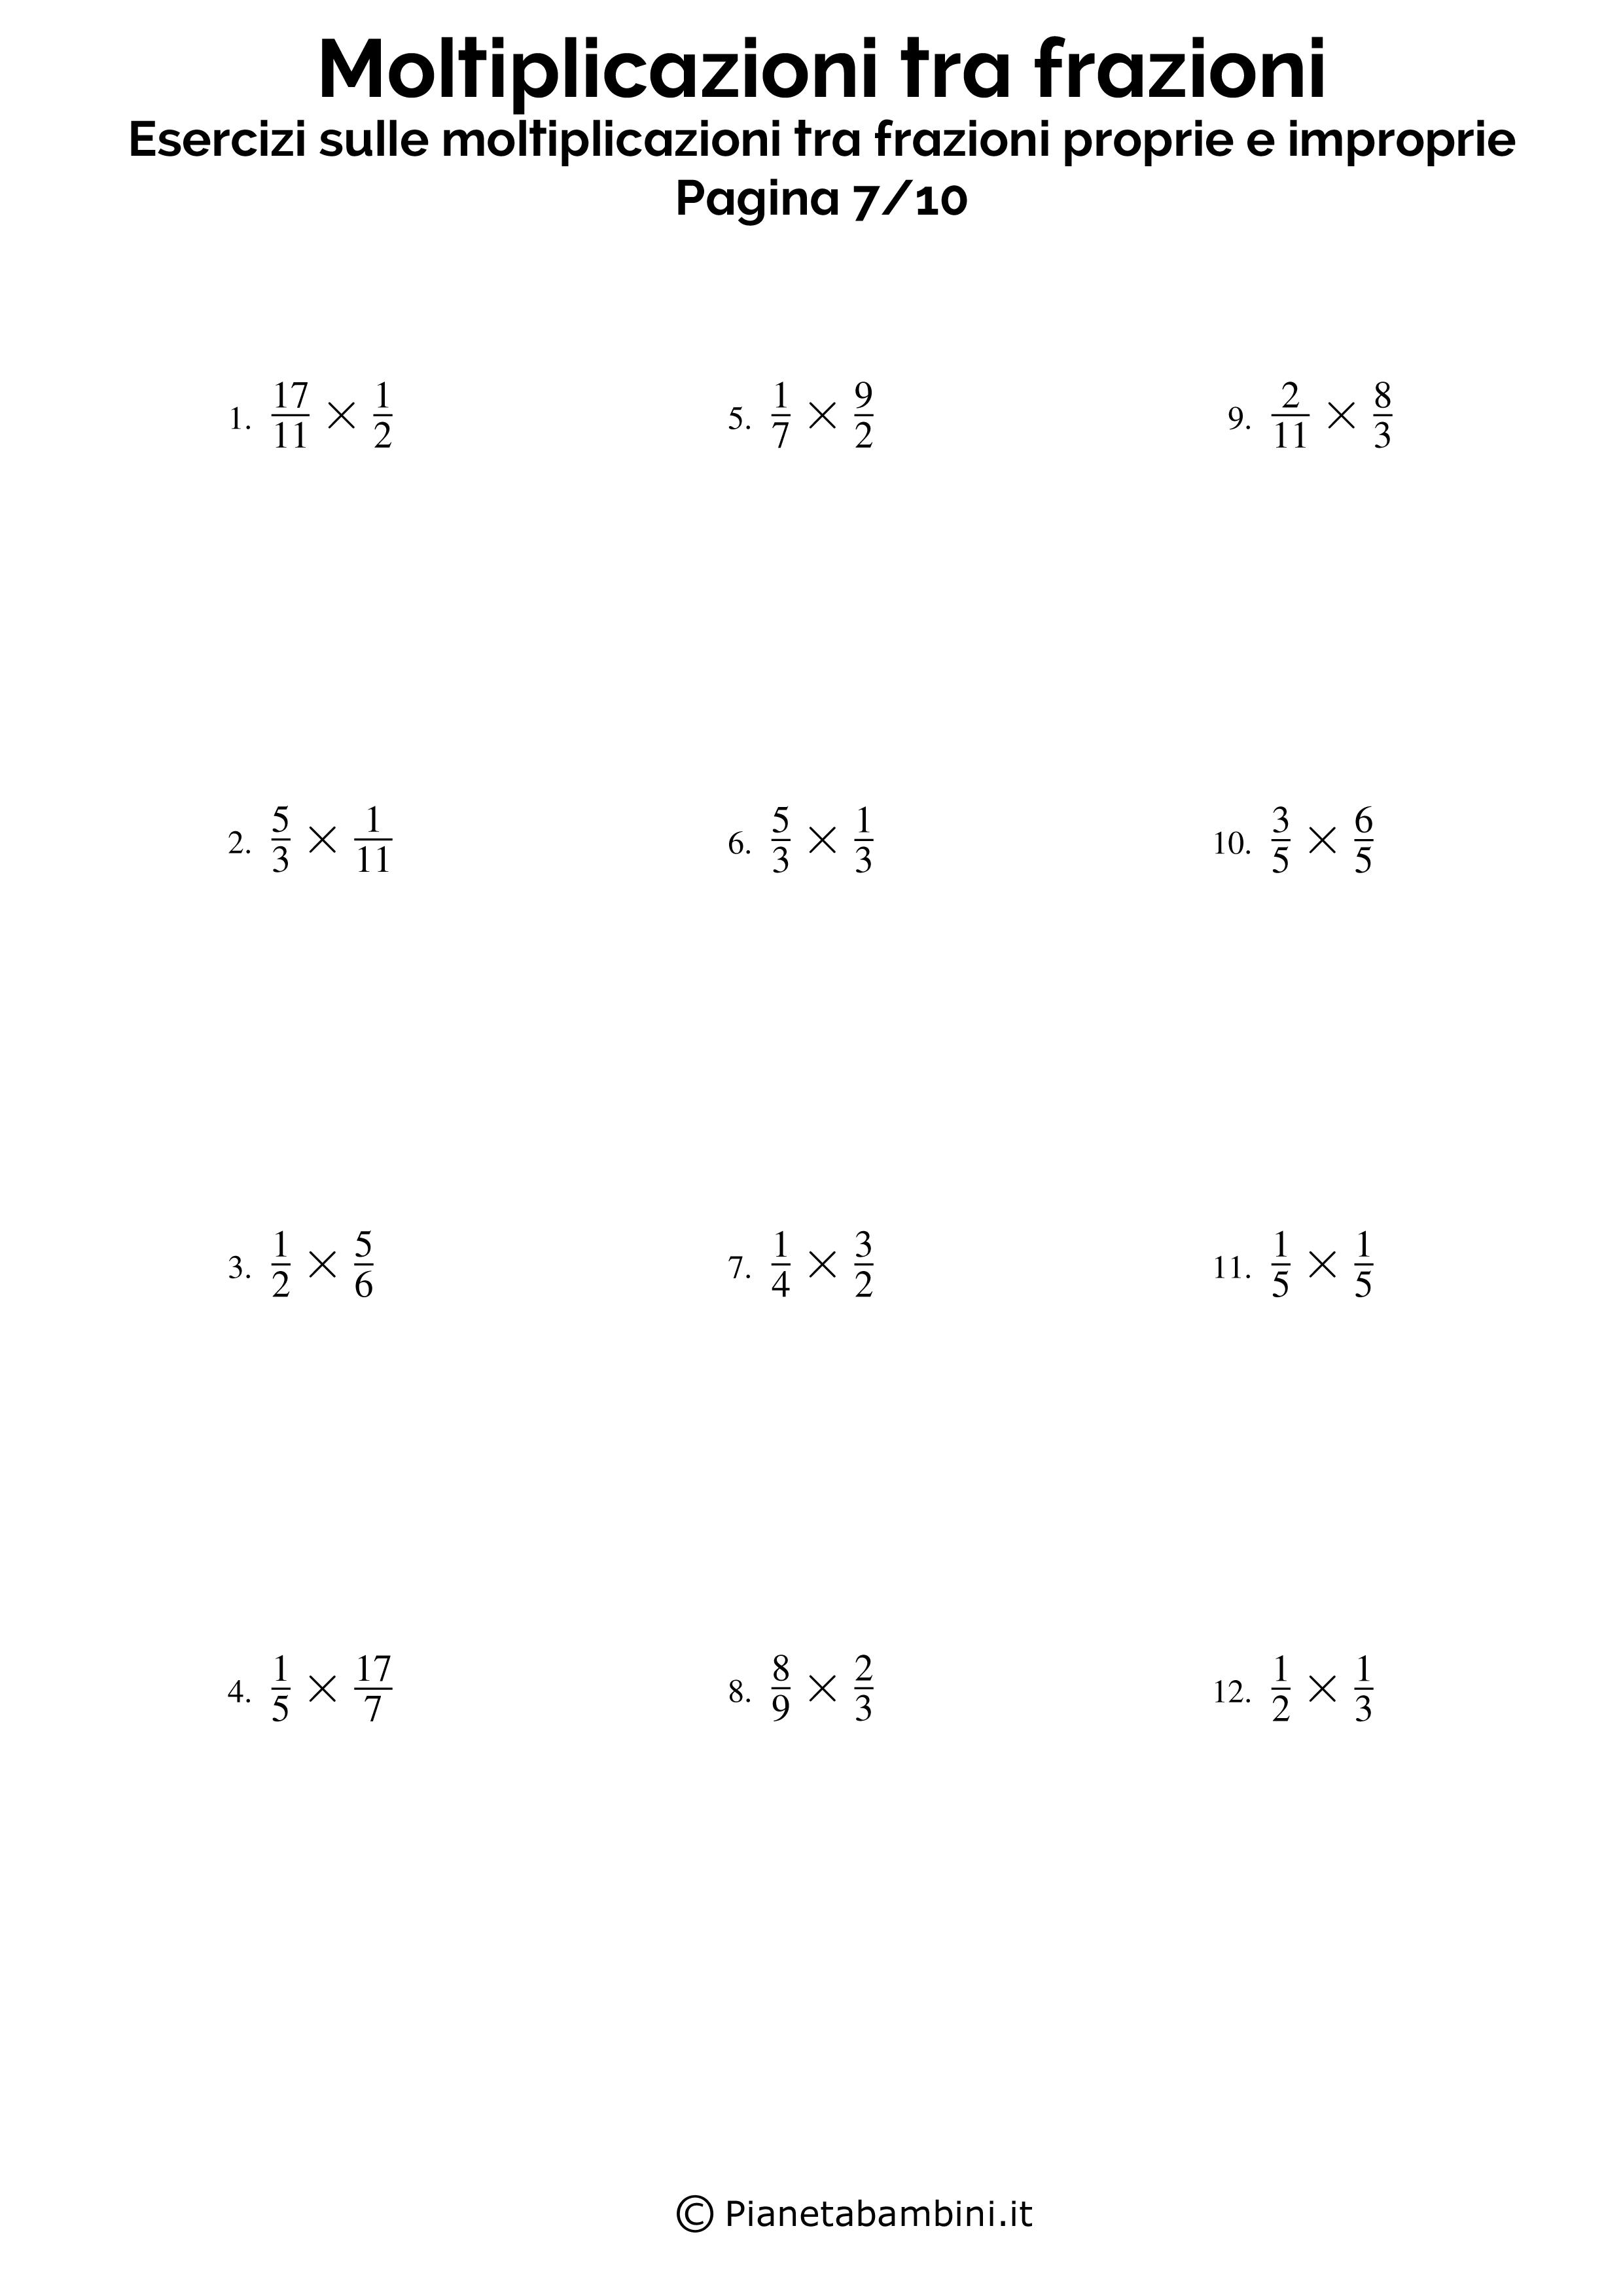 Moltiplicazioni-Frazioni-Proprie-Improprie_07